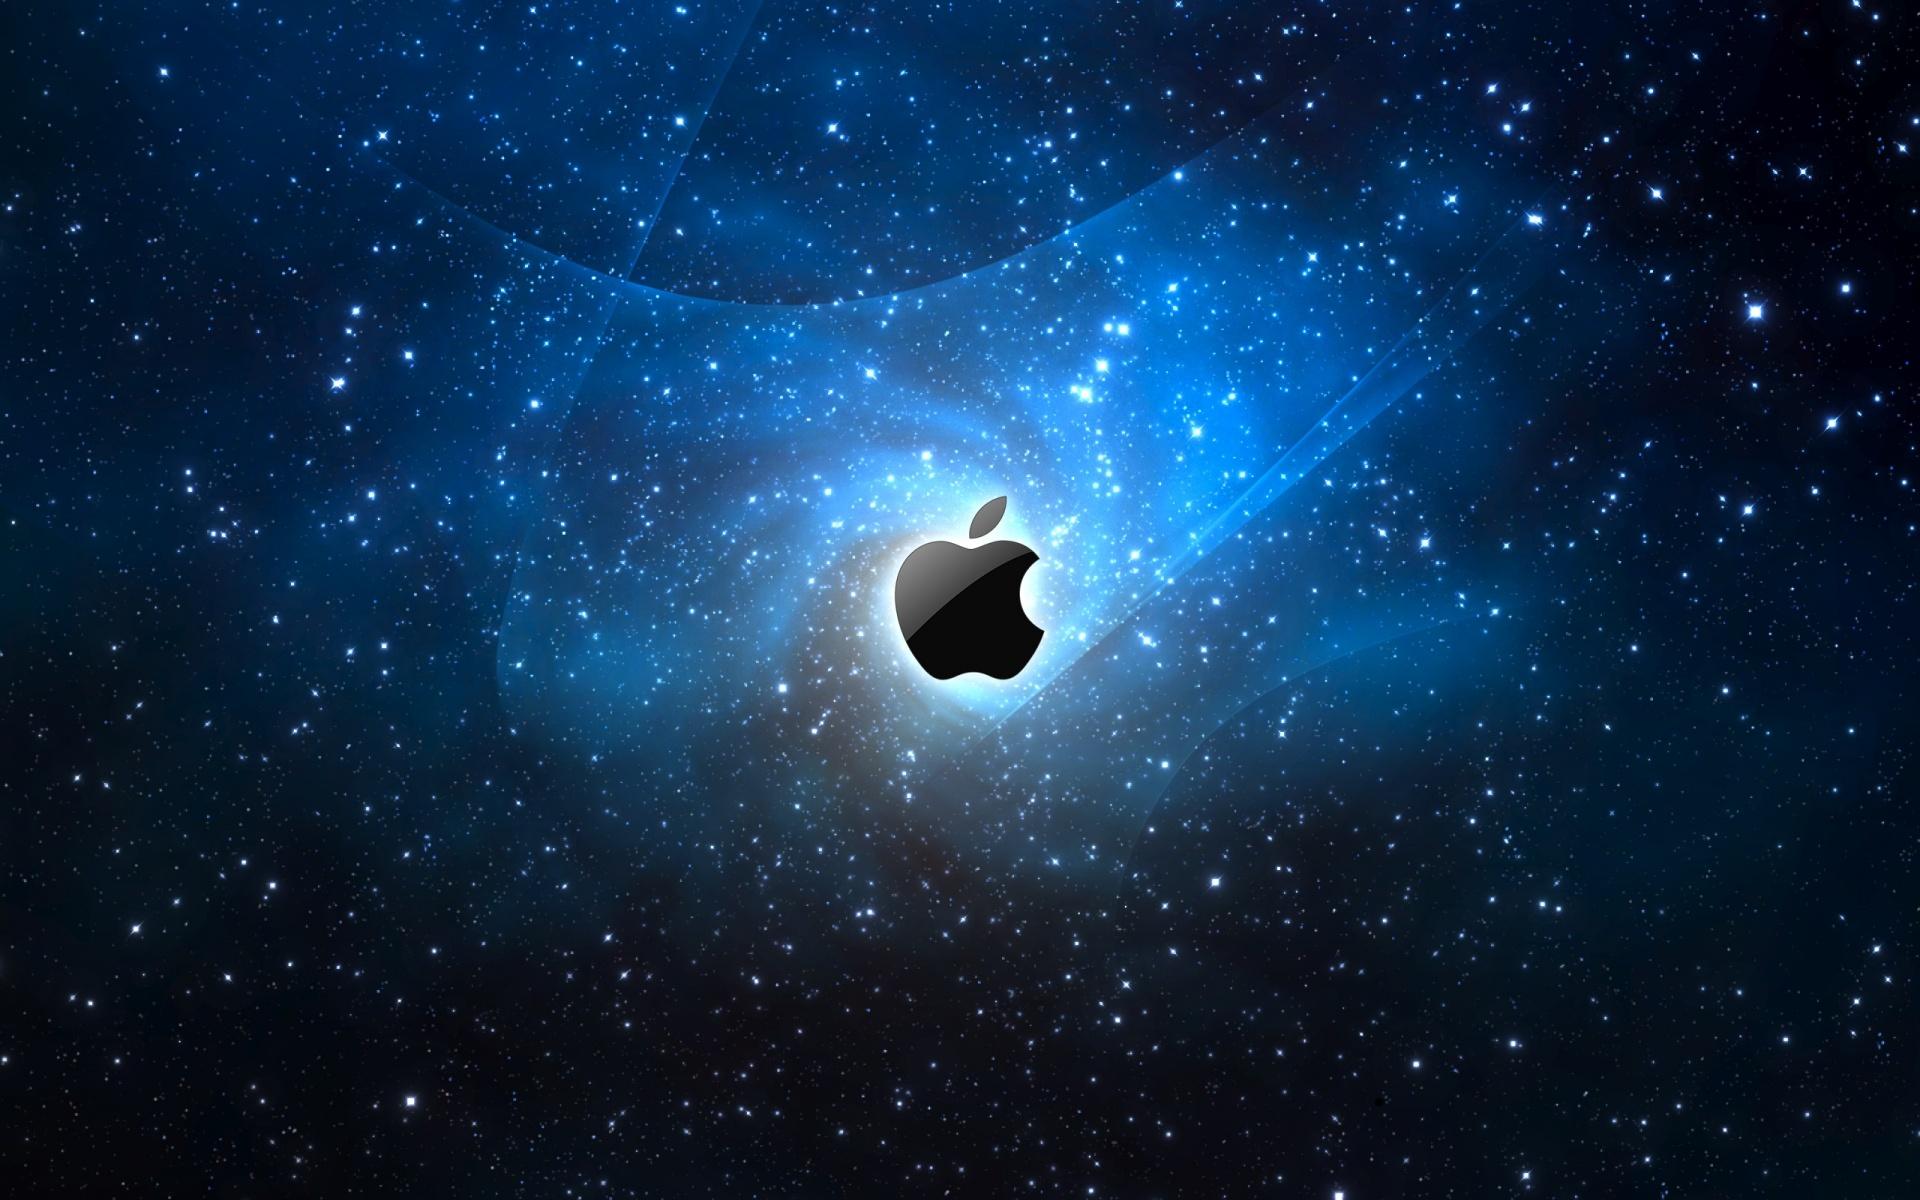 Apple Logo Wallpapers-0 Apple Logo Wallpapers-1 ...